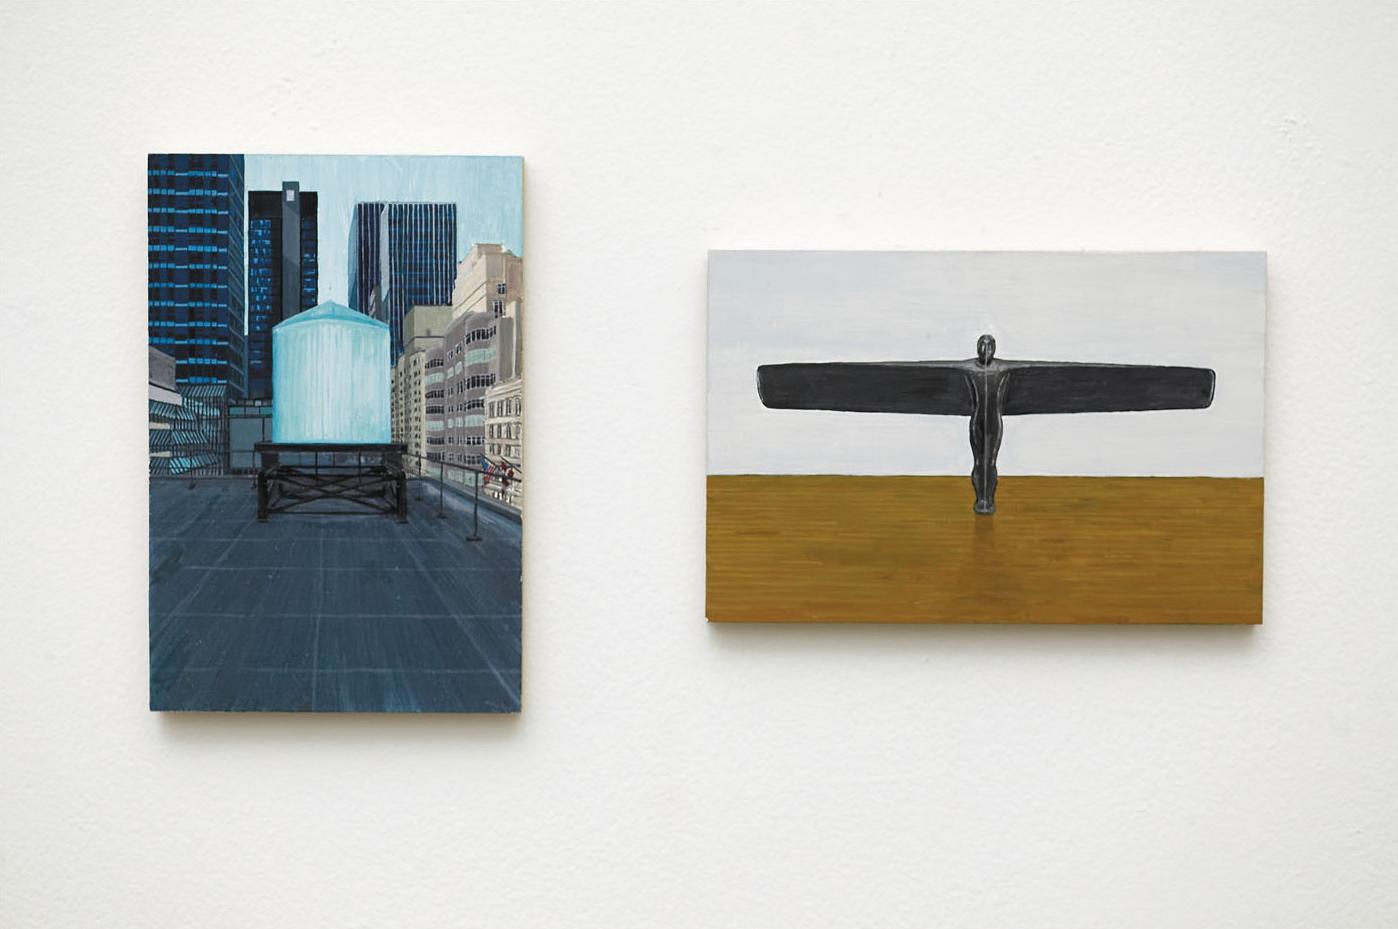 RACHEL + ANTONY Acrylic on Plywood 2 Panels Each 10 x 15 cm